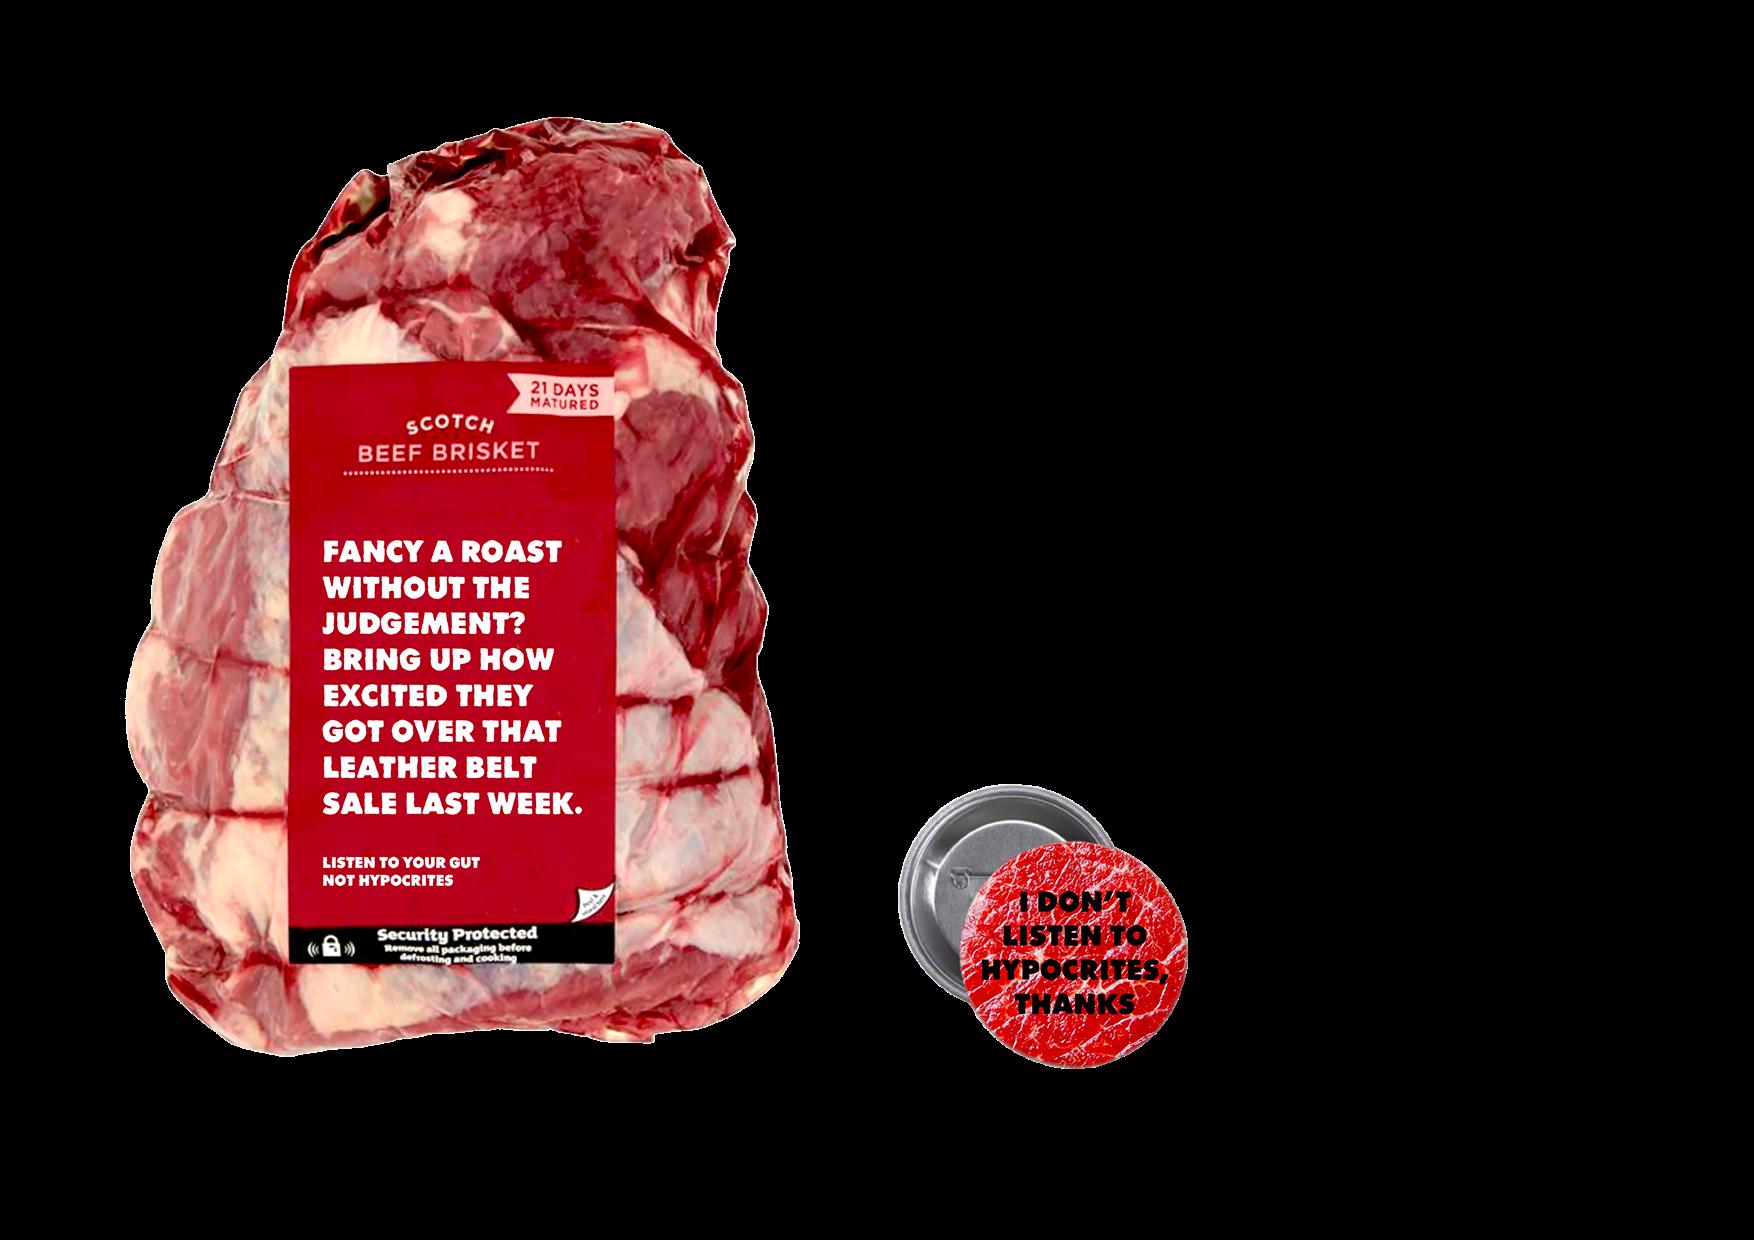 Alexandra Binding - Meat_shoppingextensionv2